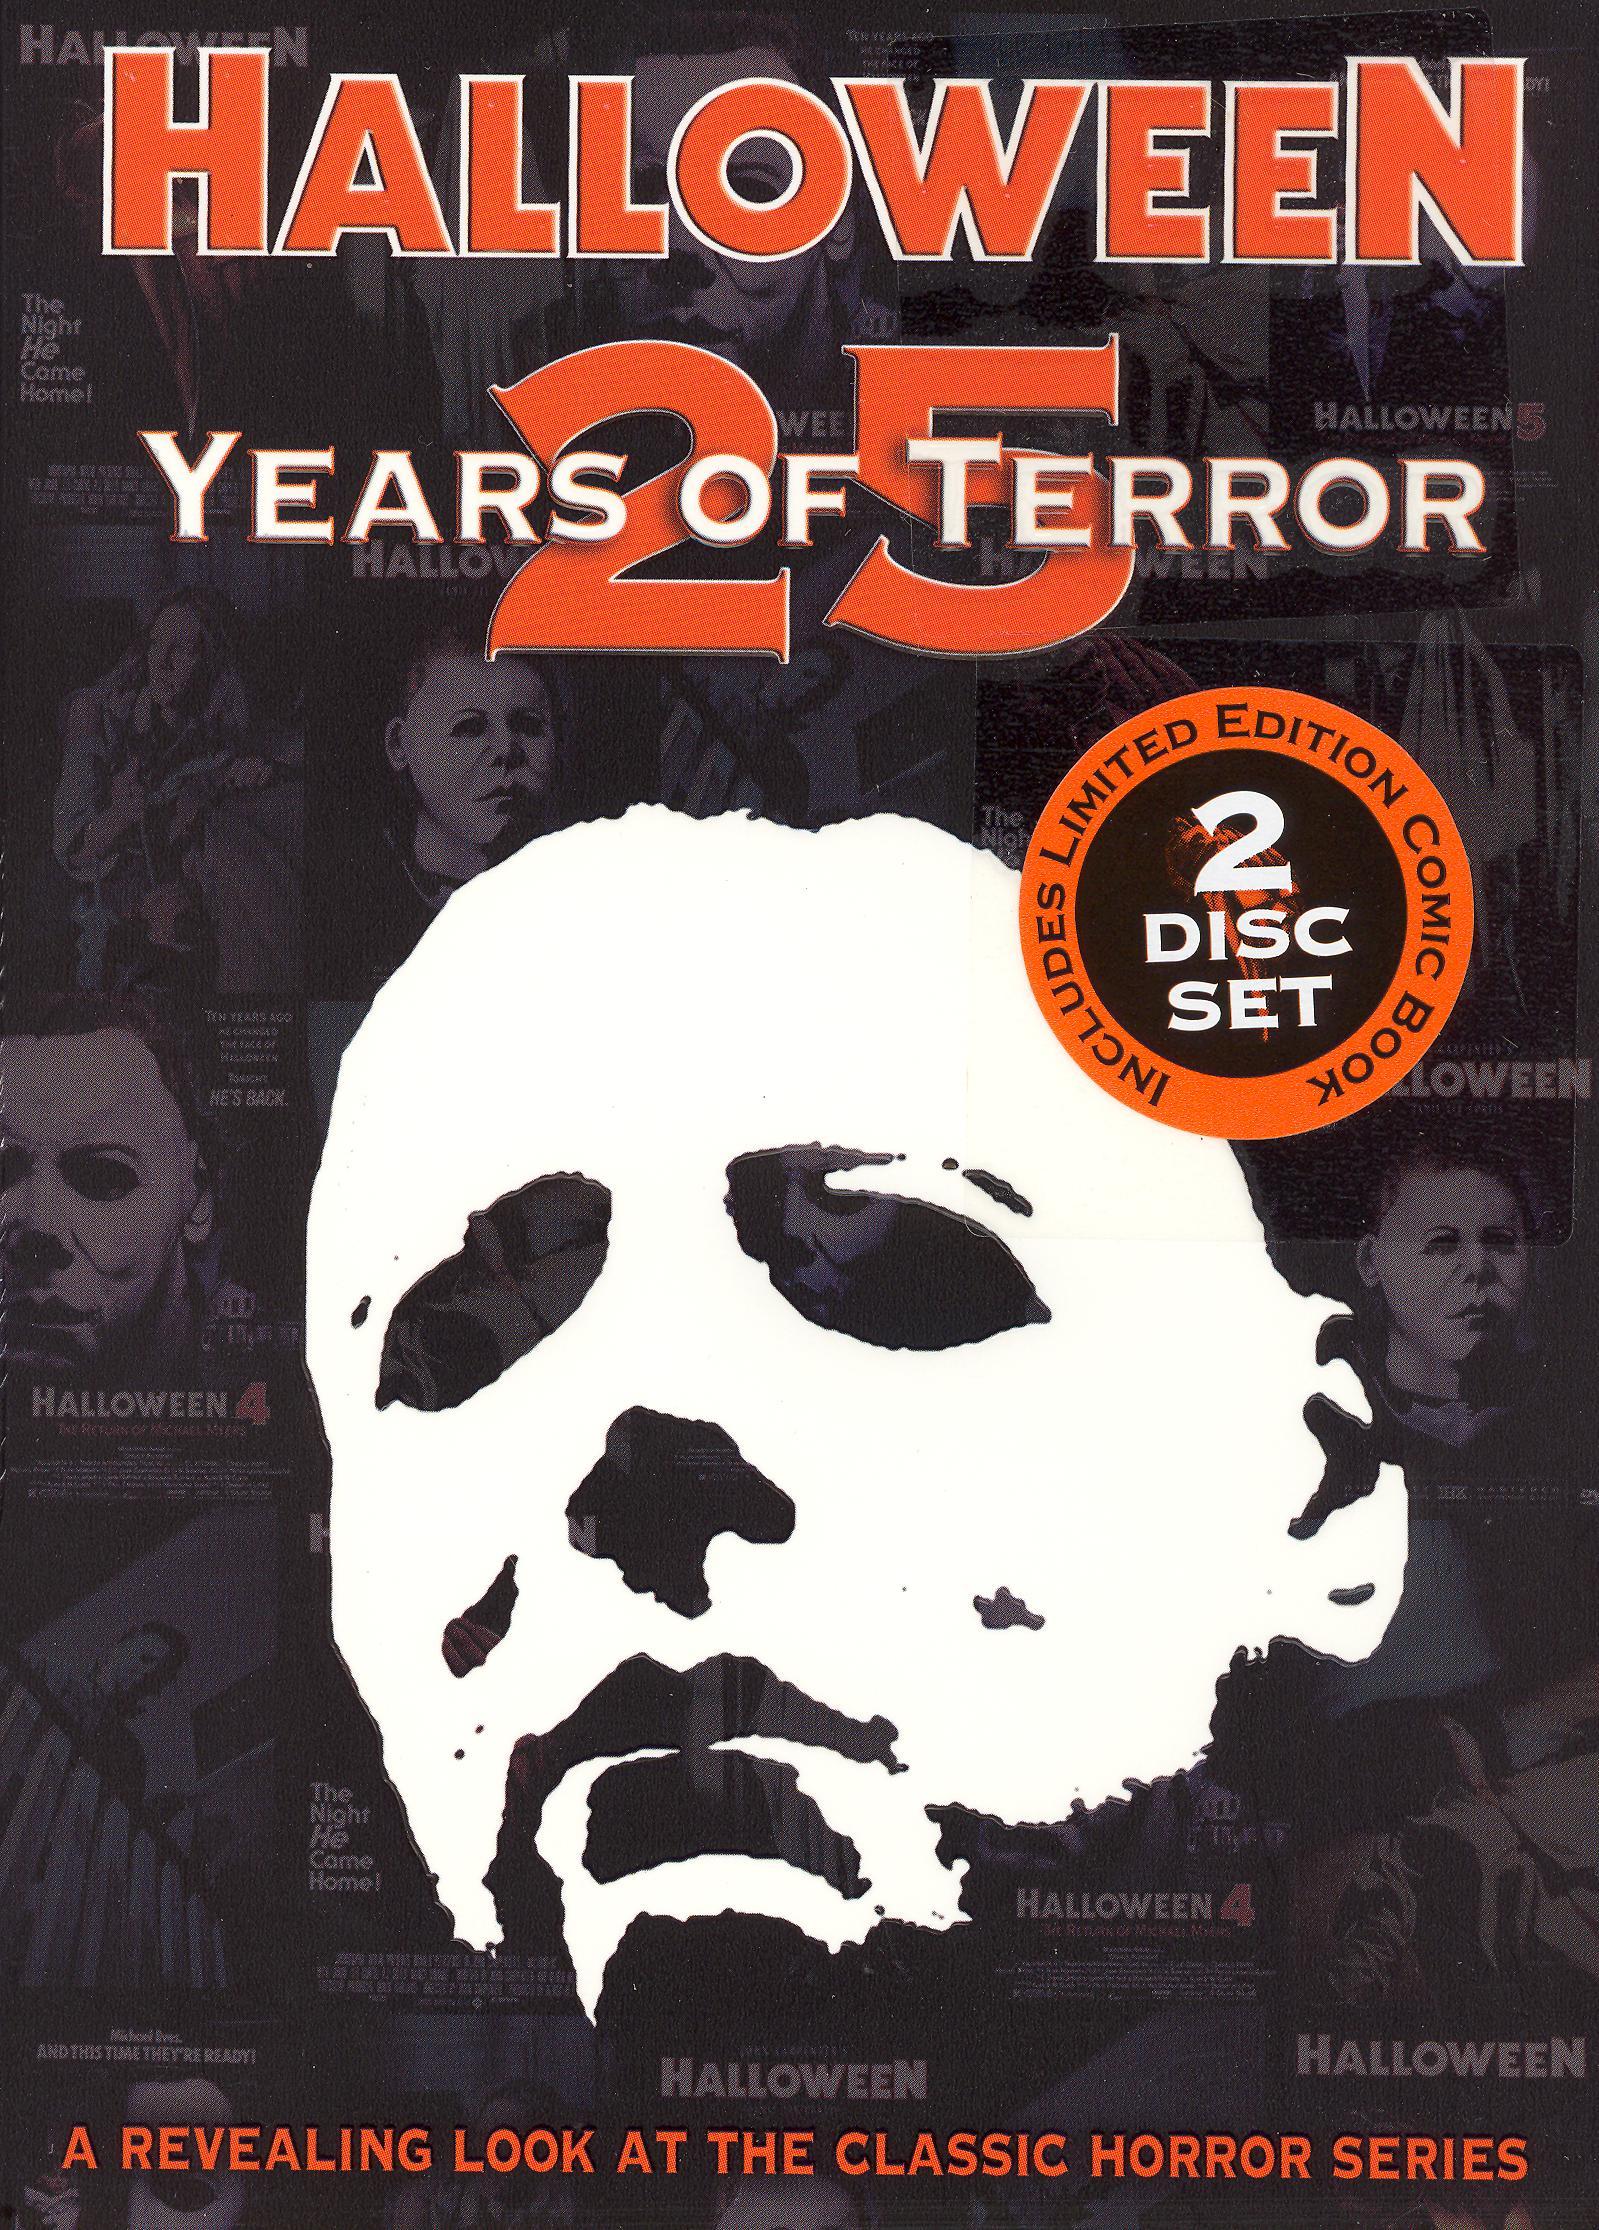 Halloween: 25 Years of Terror